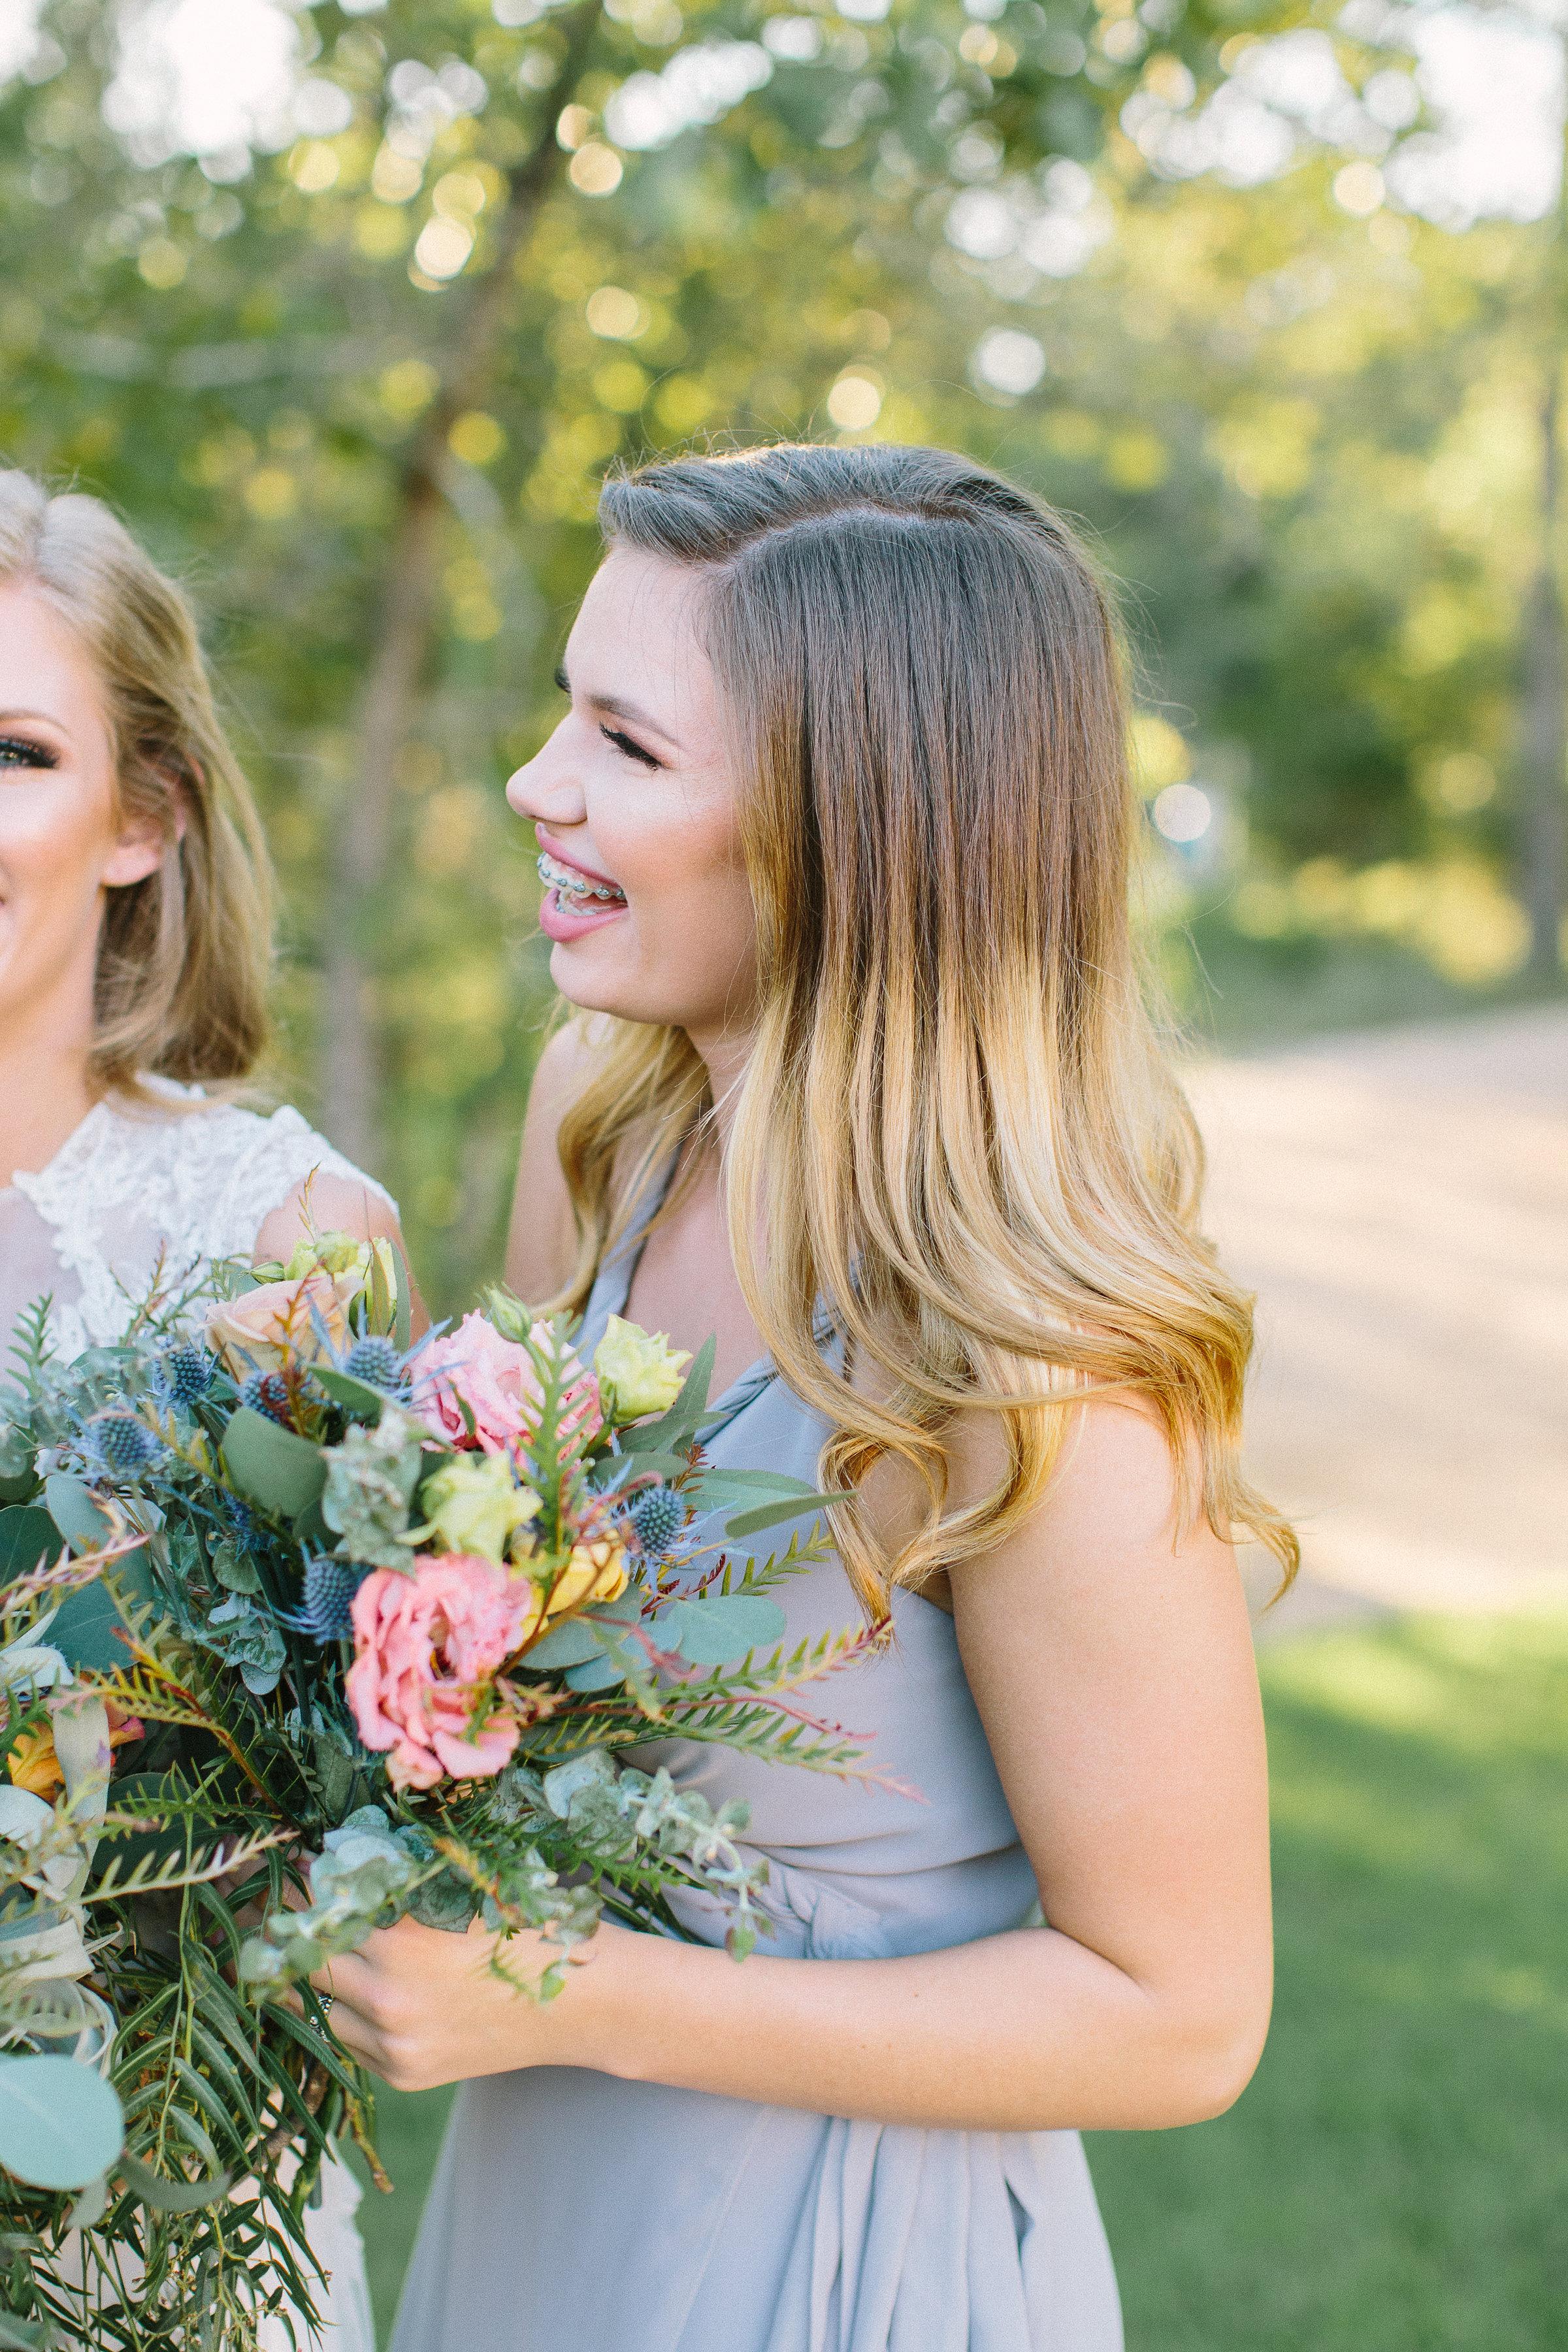 Ellen-Ashton-Photography-Peach-Creek-Ranch-Weddings-Wed-and-Prosper253